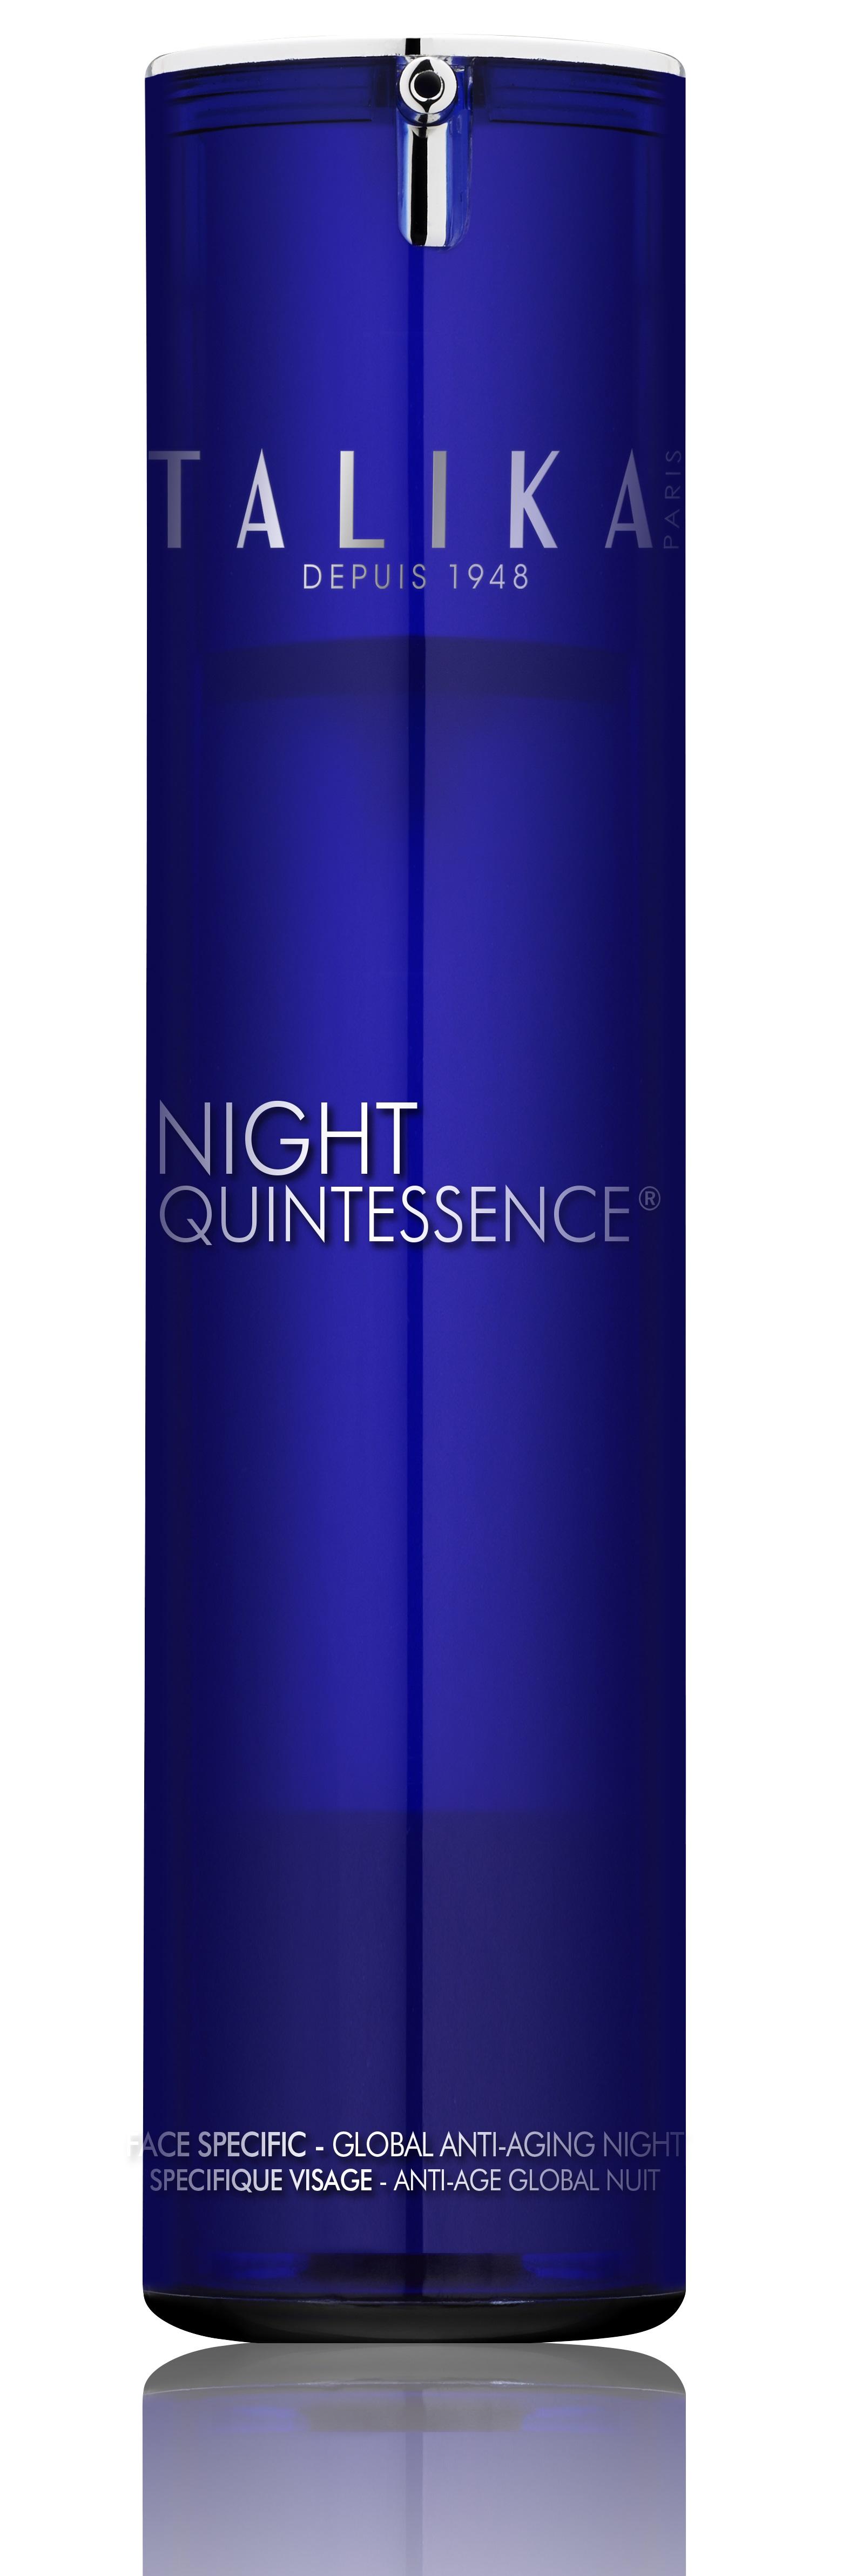 Talika_Night Quintessence